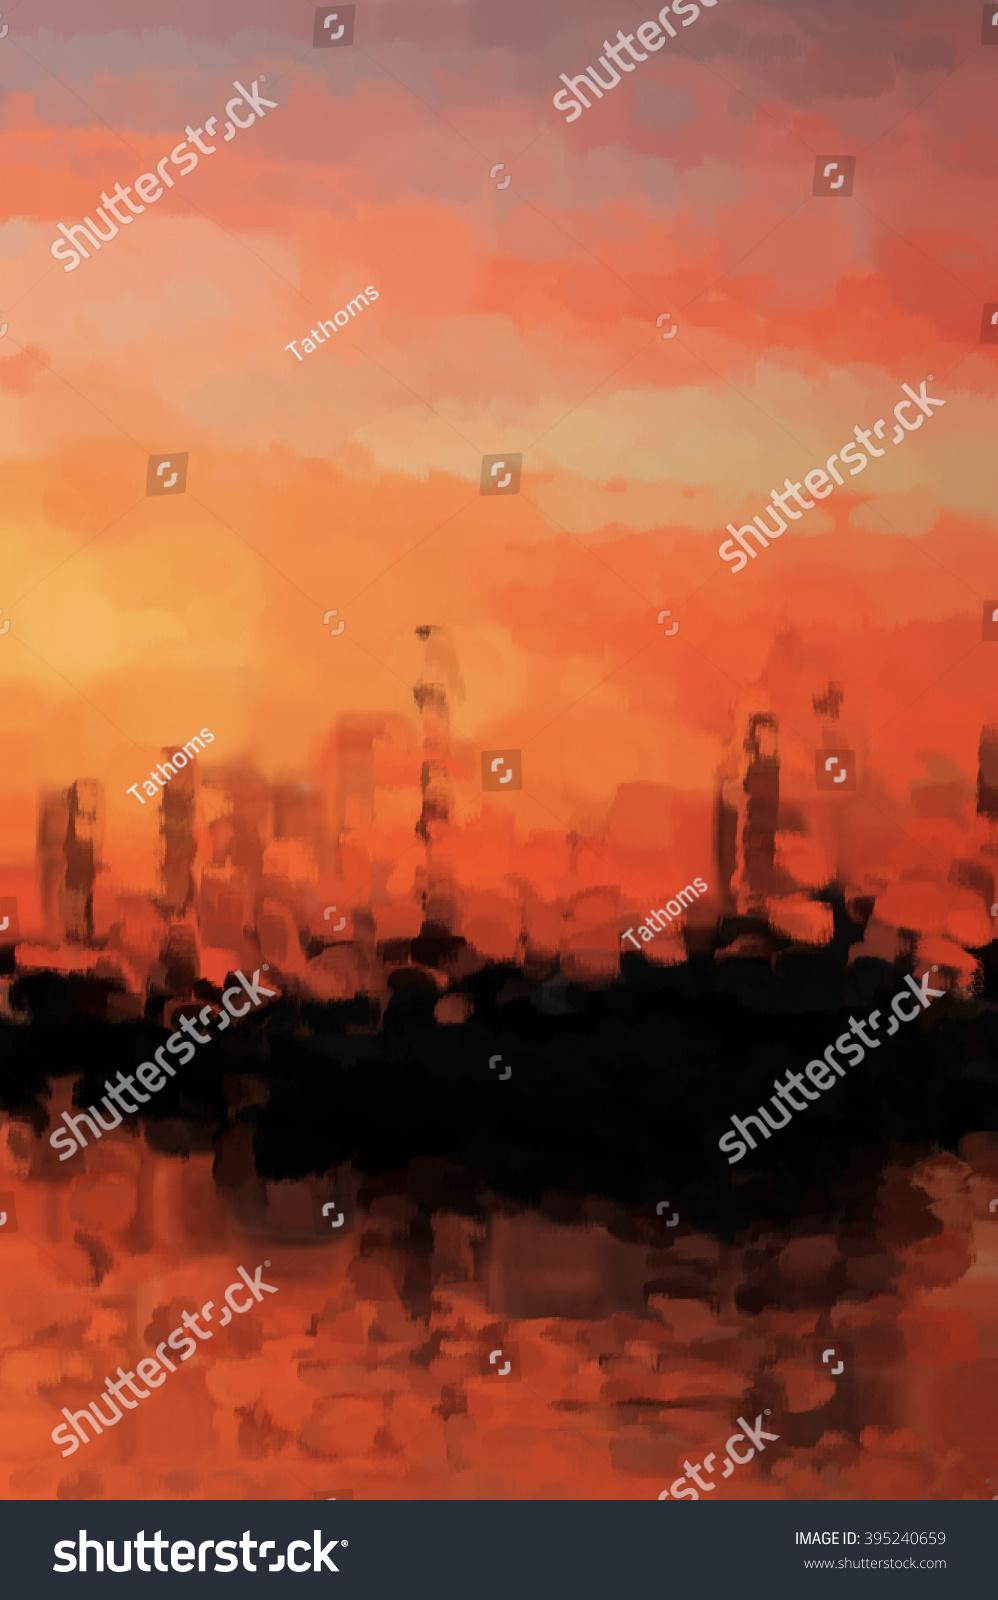 stock-photo-red-evening-marina-abstract-